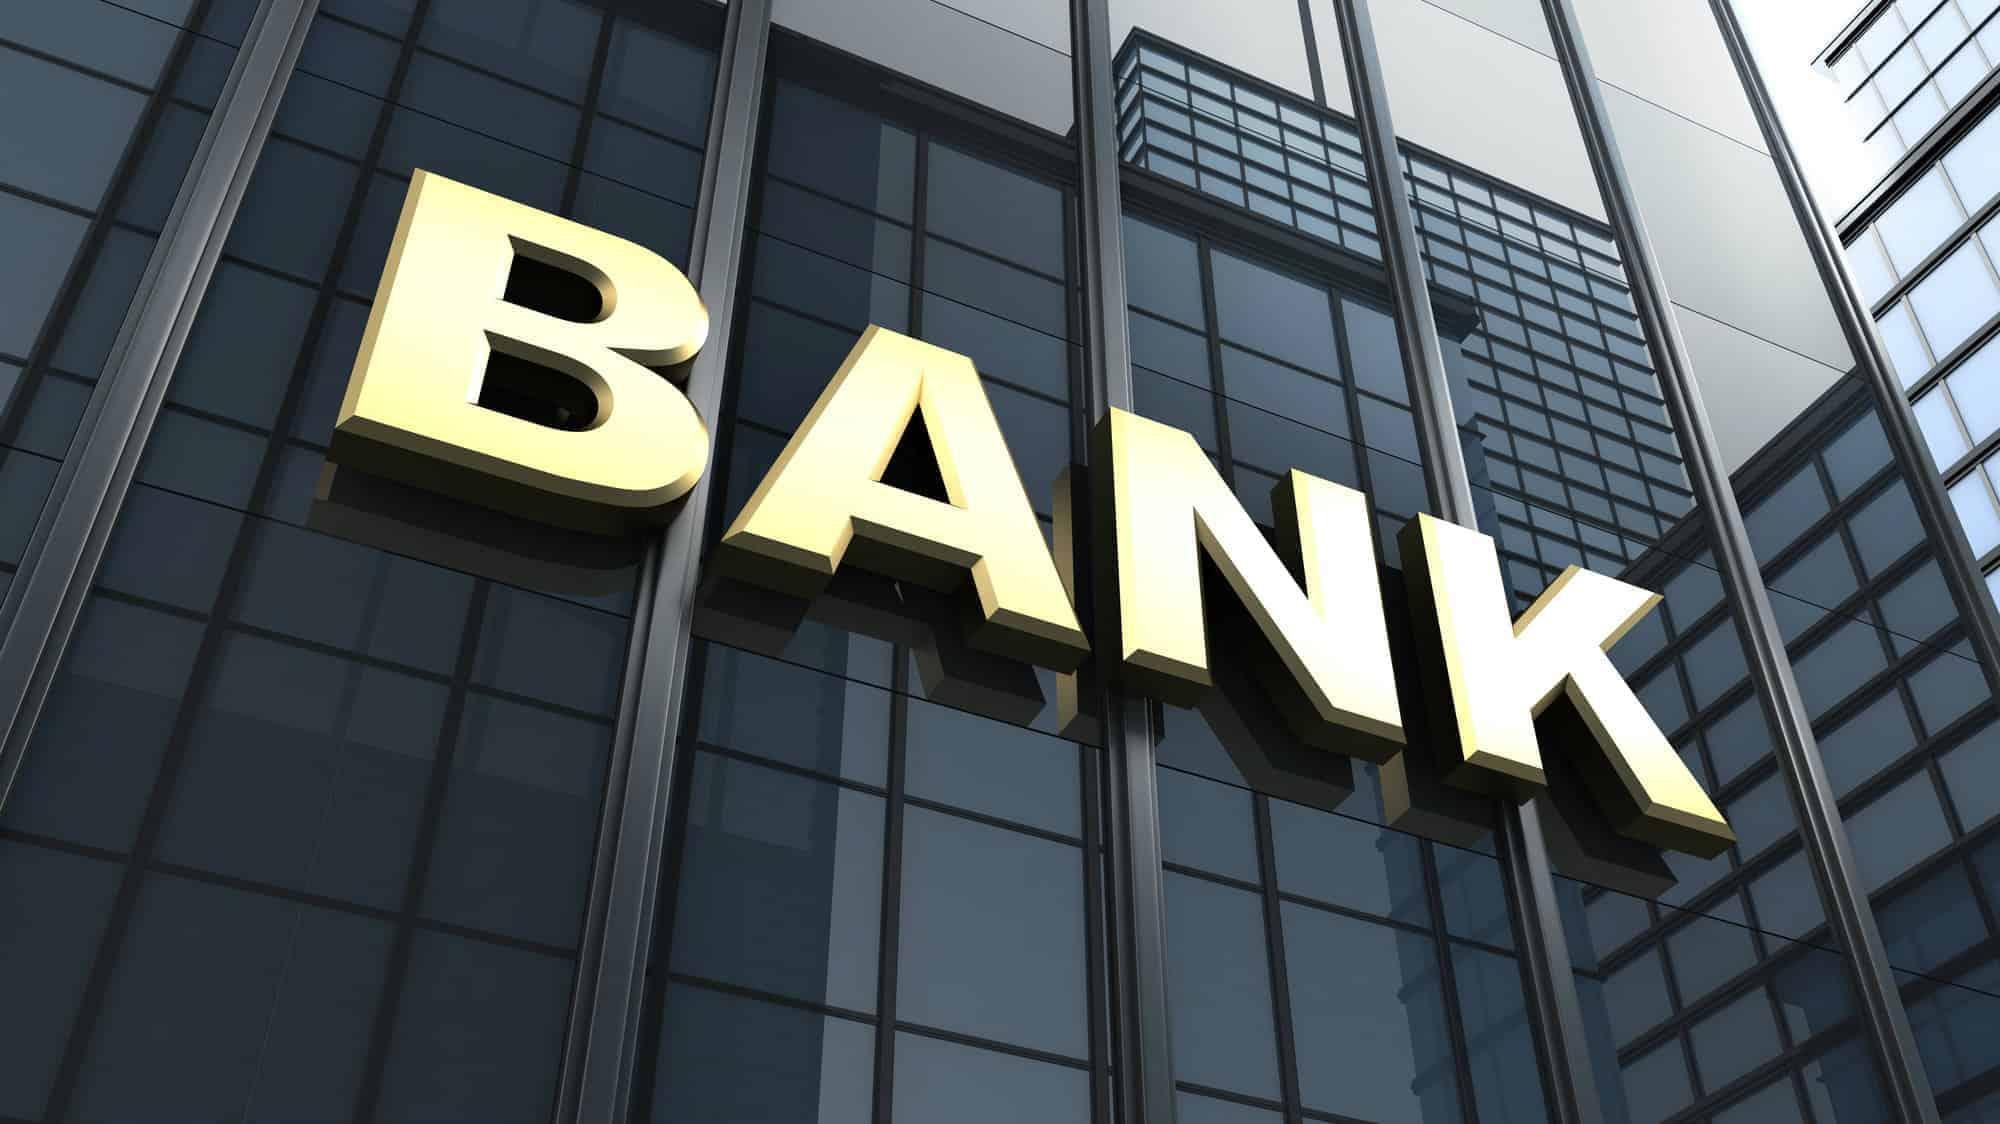 National Development Banks (NDBs) ... น้ำมันหล่อลื่นเศรษฐกิจในช่วงวิกฤต